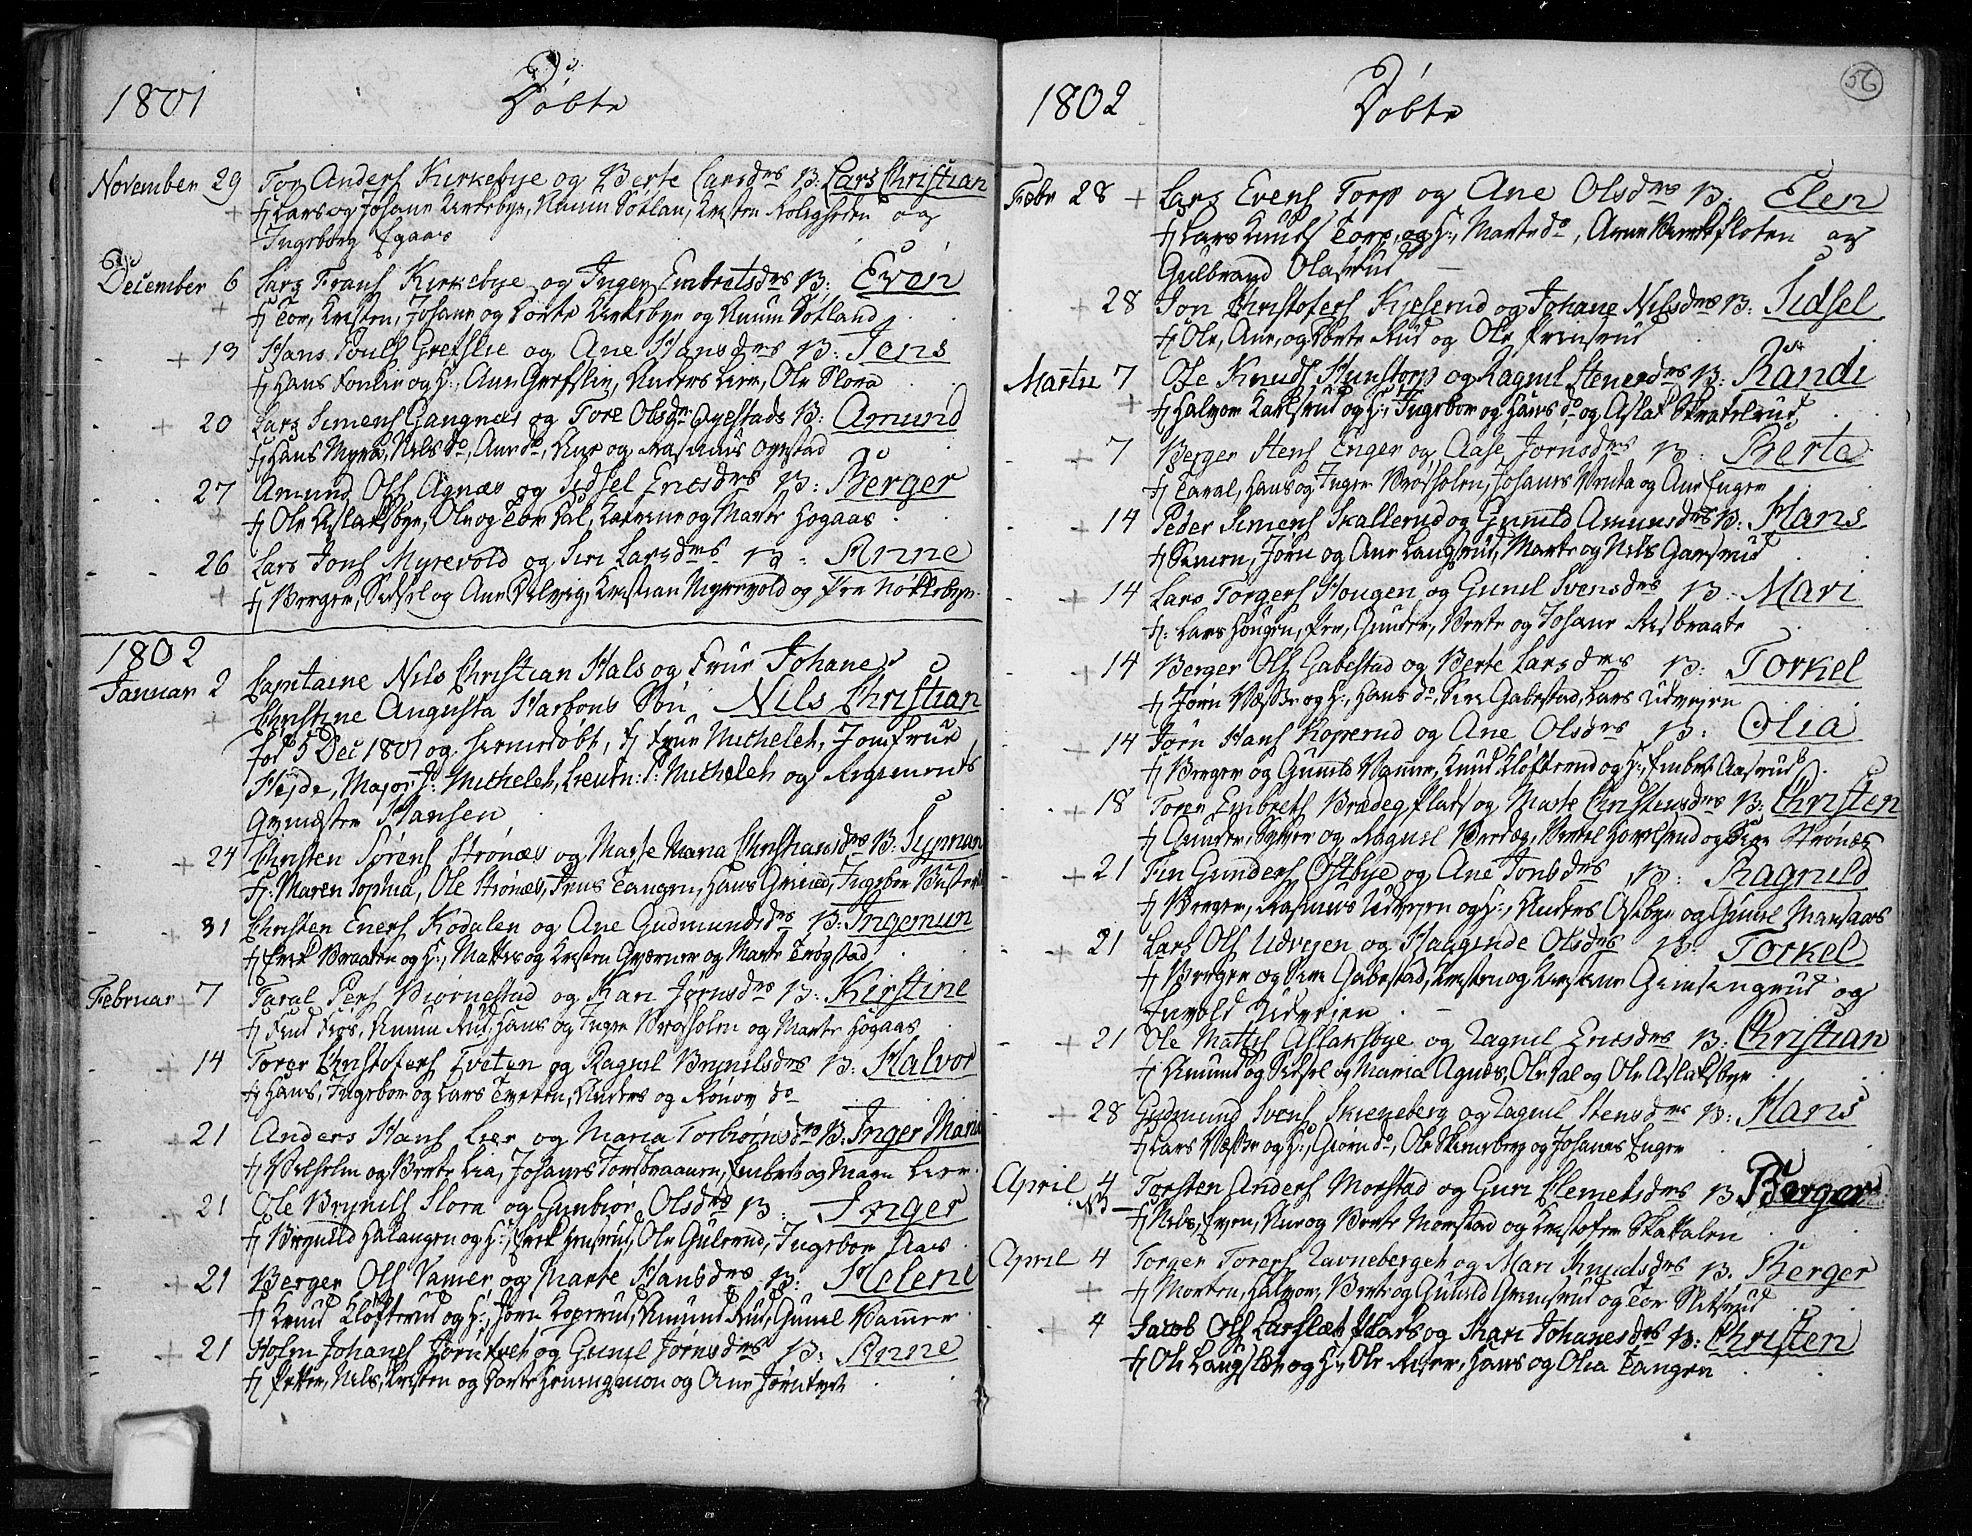 SAO, Trøgstad prestekontor Kirkebøker, F/Fa/L0005: Ministerialbok nr. I 5, 1784-1814, s. 56